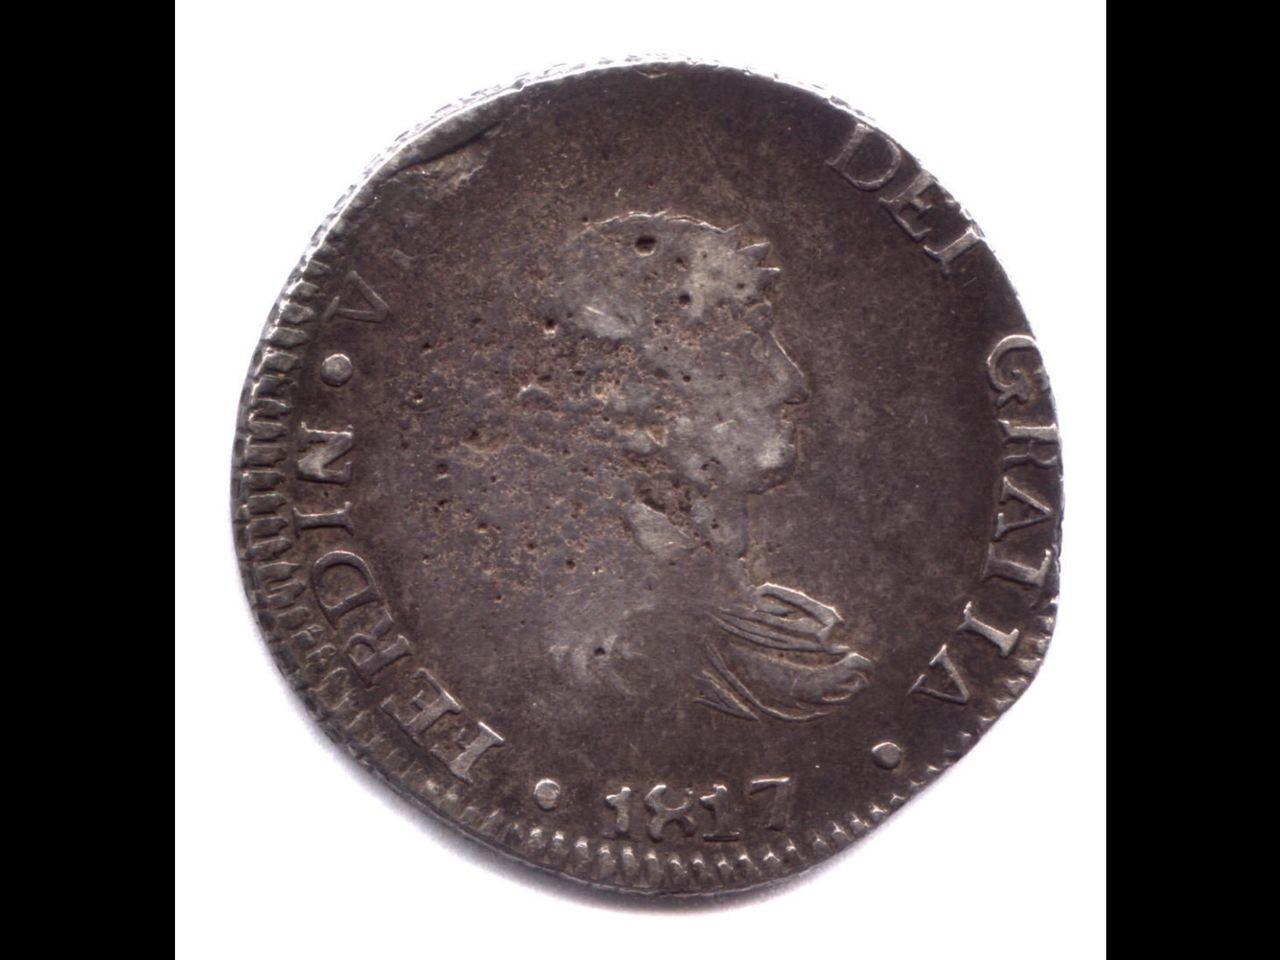 8 reales 1817 MZ. Fernando VII. Durango Image